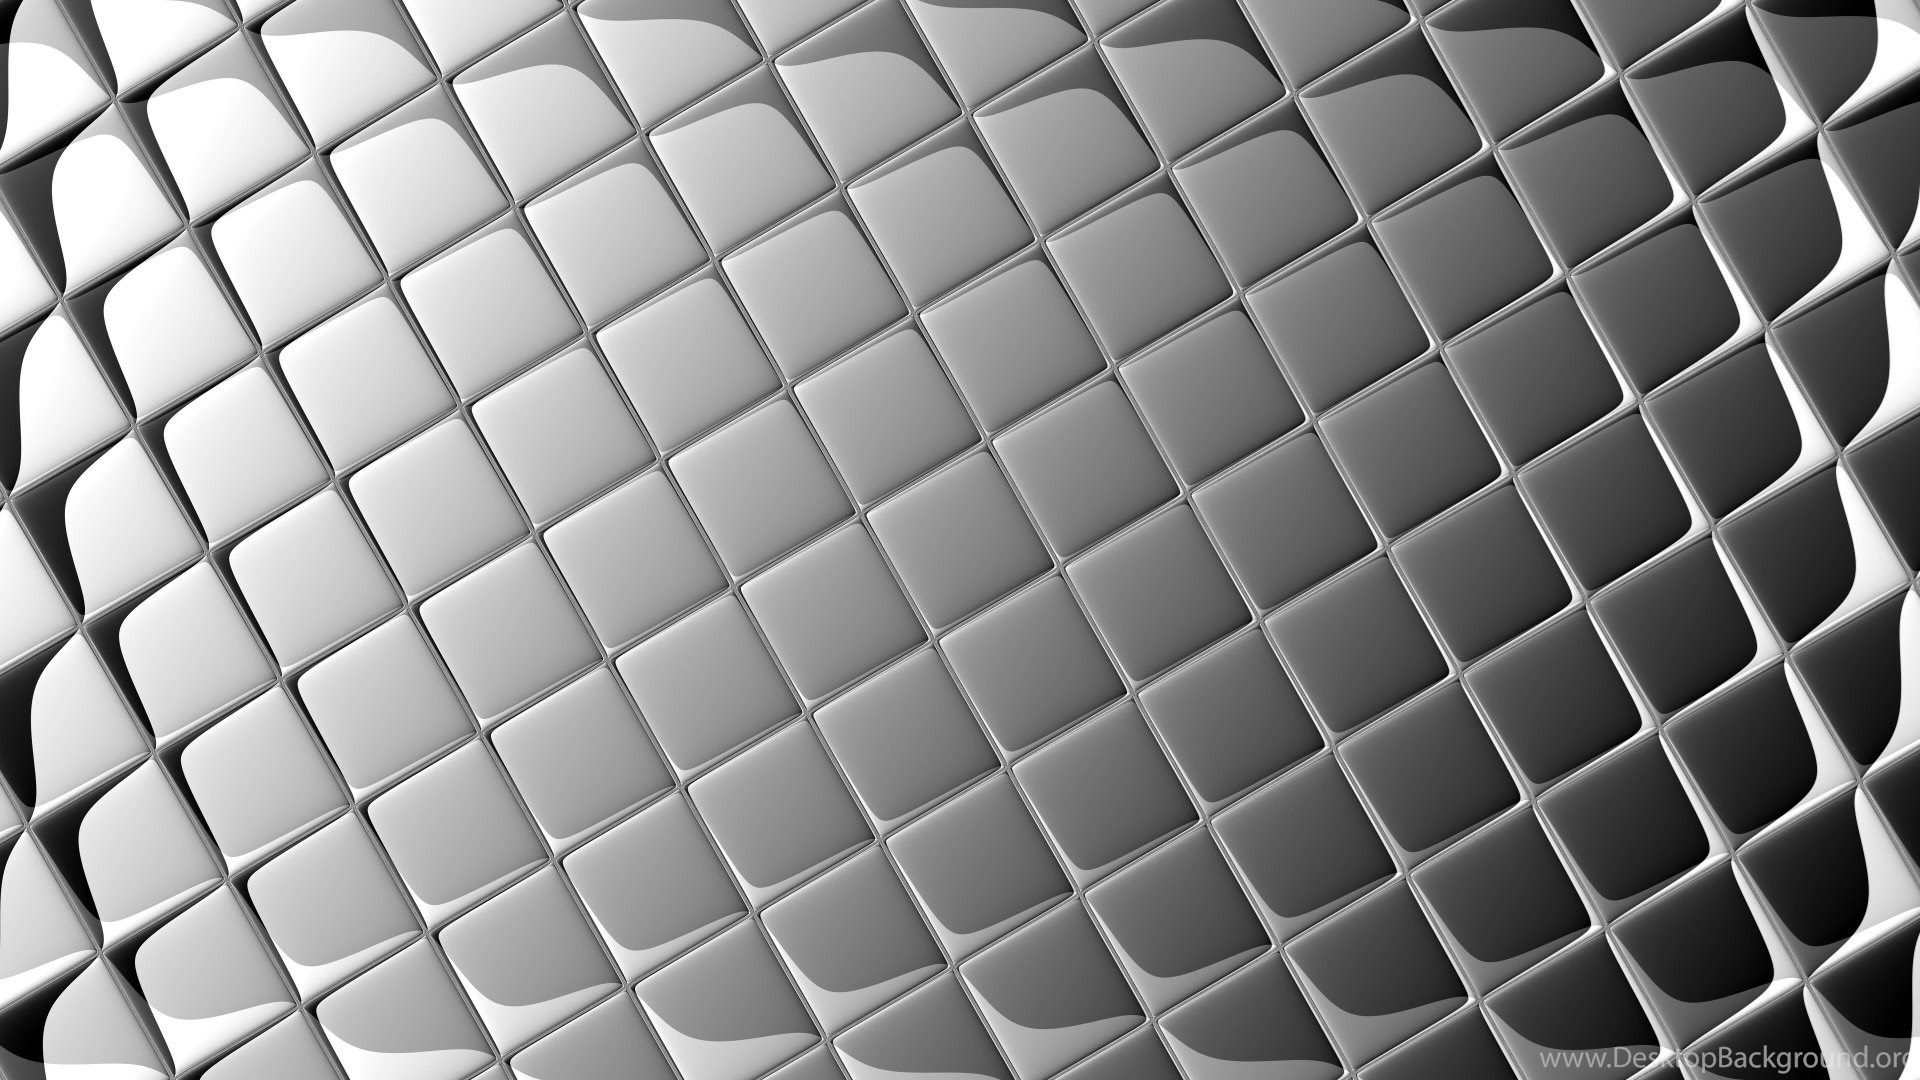 Wallpapers Nature Laptop Keren Hd Glossy Rhombus 1920x1080